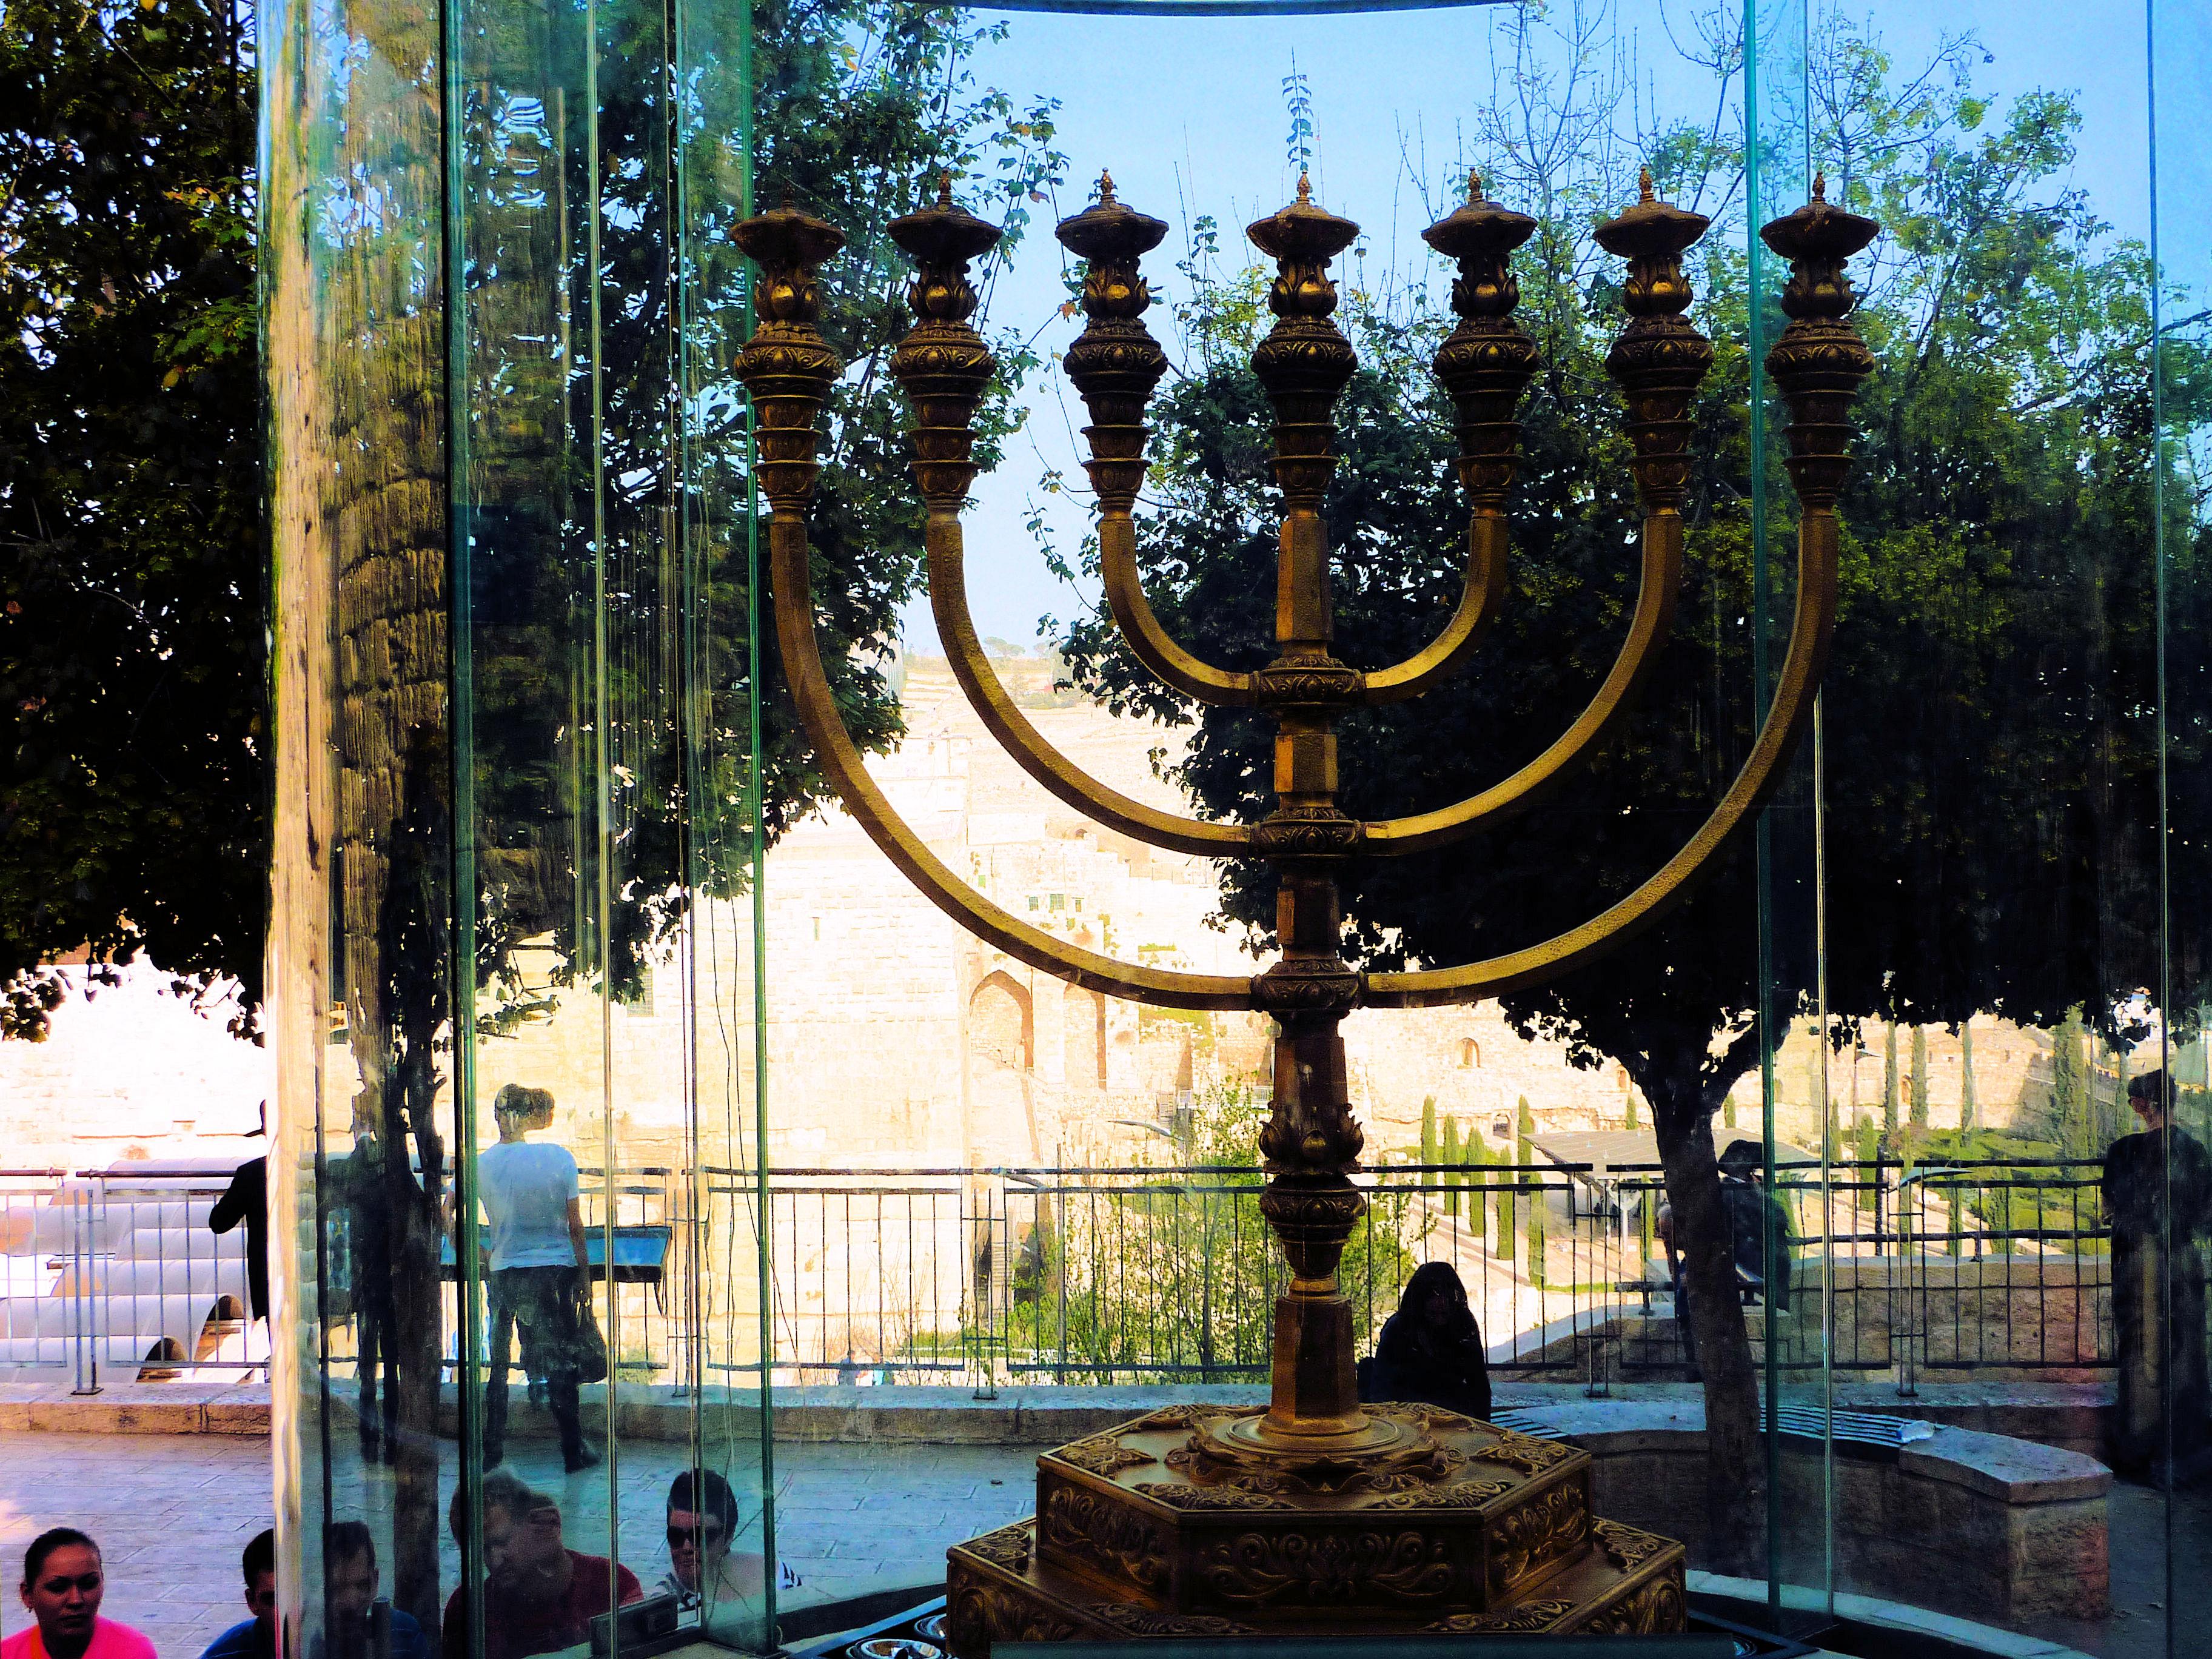 Temple Institute Holy Menorah – Western Wall Plaza, Old City Jerusalem, Israel